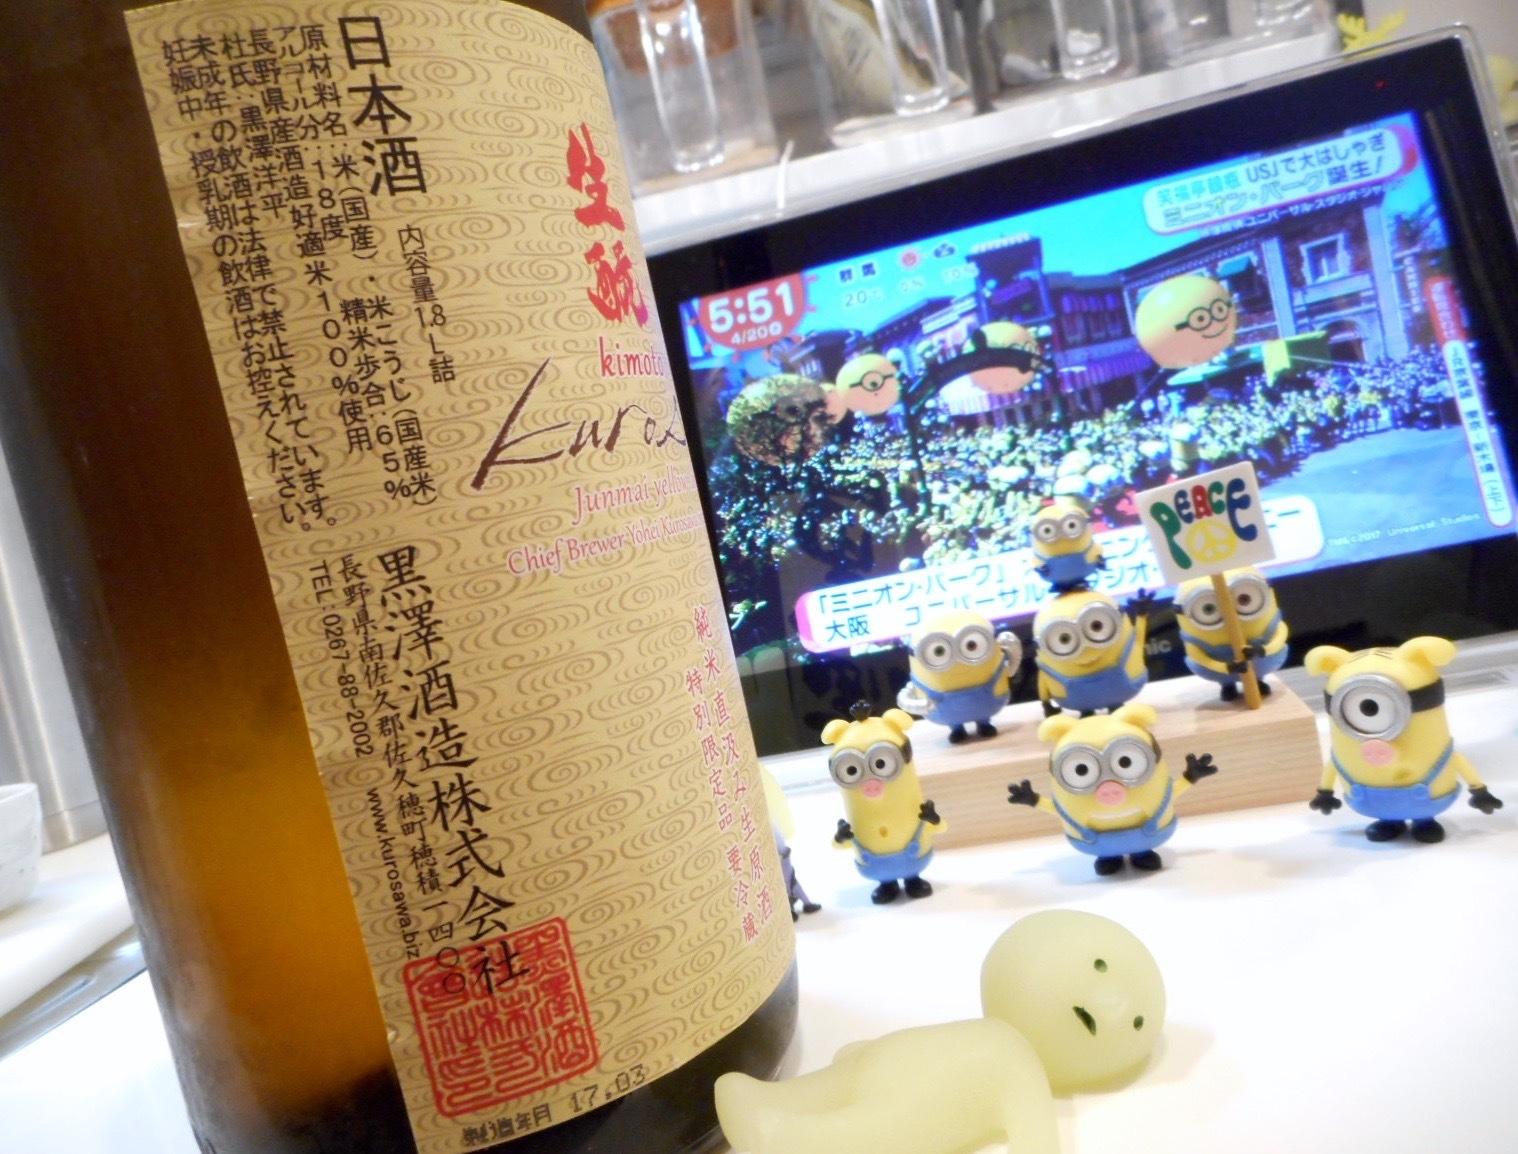 kurosawa_jikagumi_yellow28by2.jpg